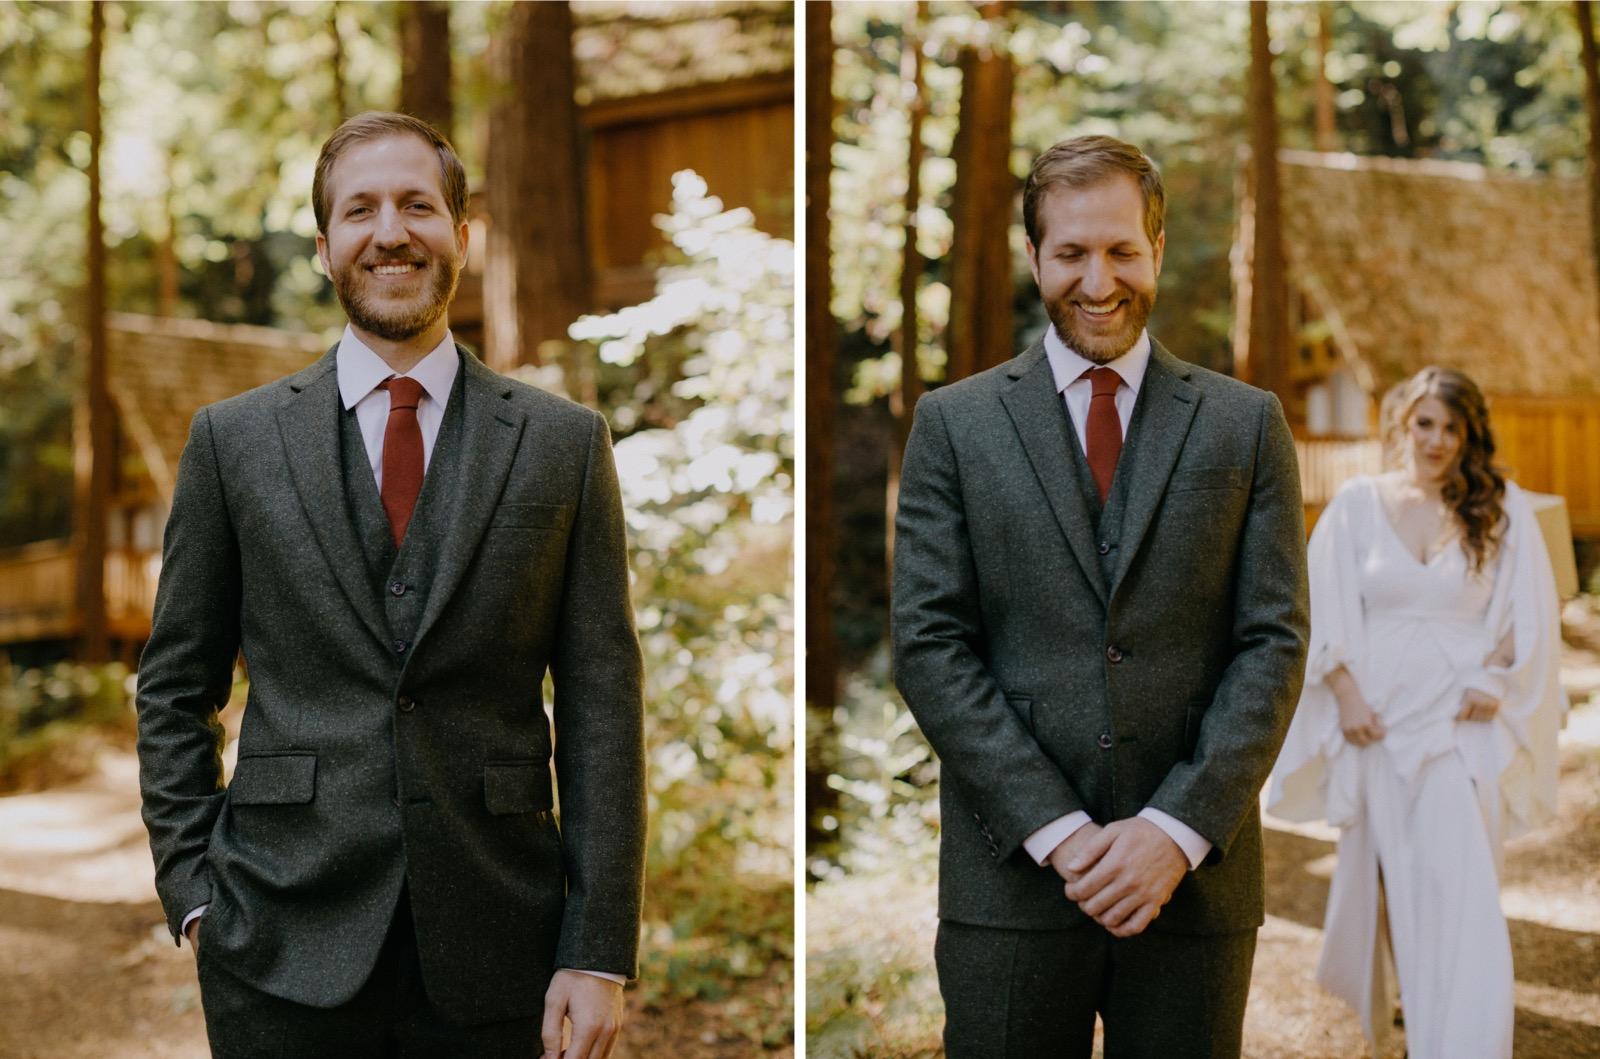 027_Emily & Jeff Wedding 0197_Emily & Jeff Wedding 0190_forest_bride_outdoor_first-look_moments_groom_wedding